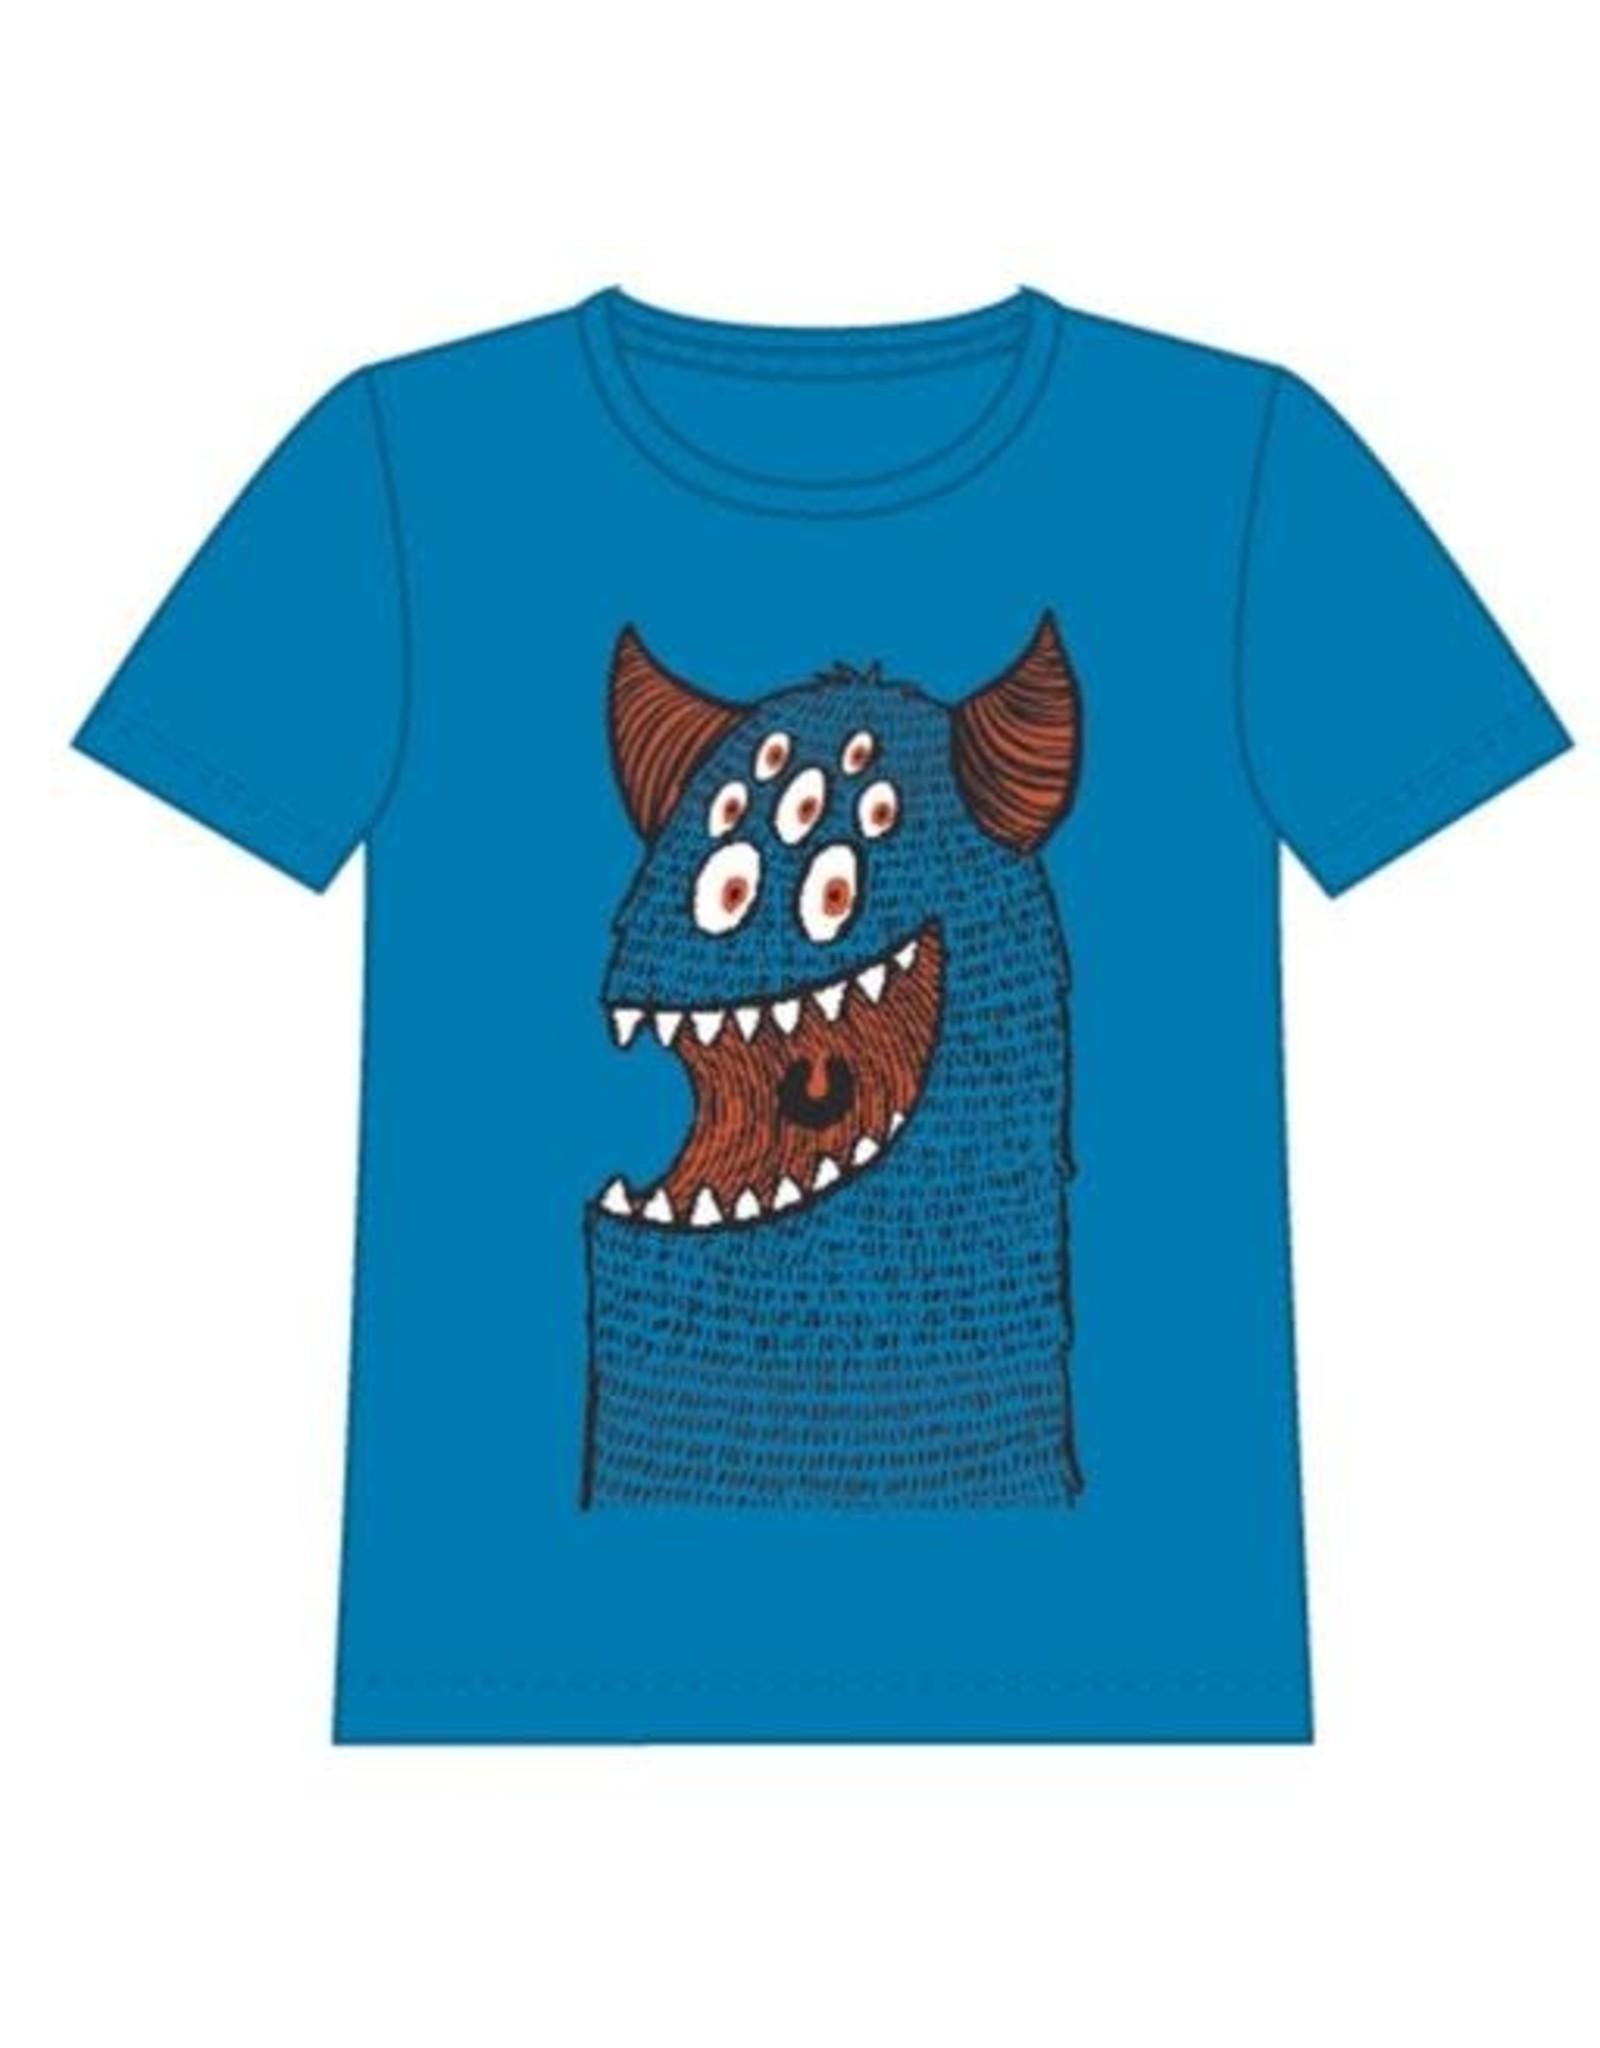 Name It Blauwe monster t-shirt